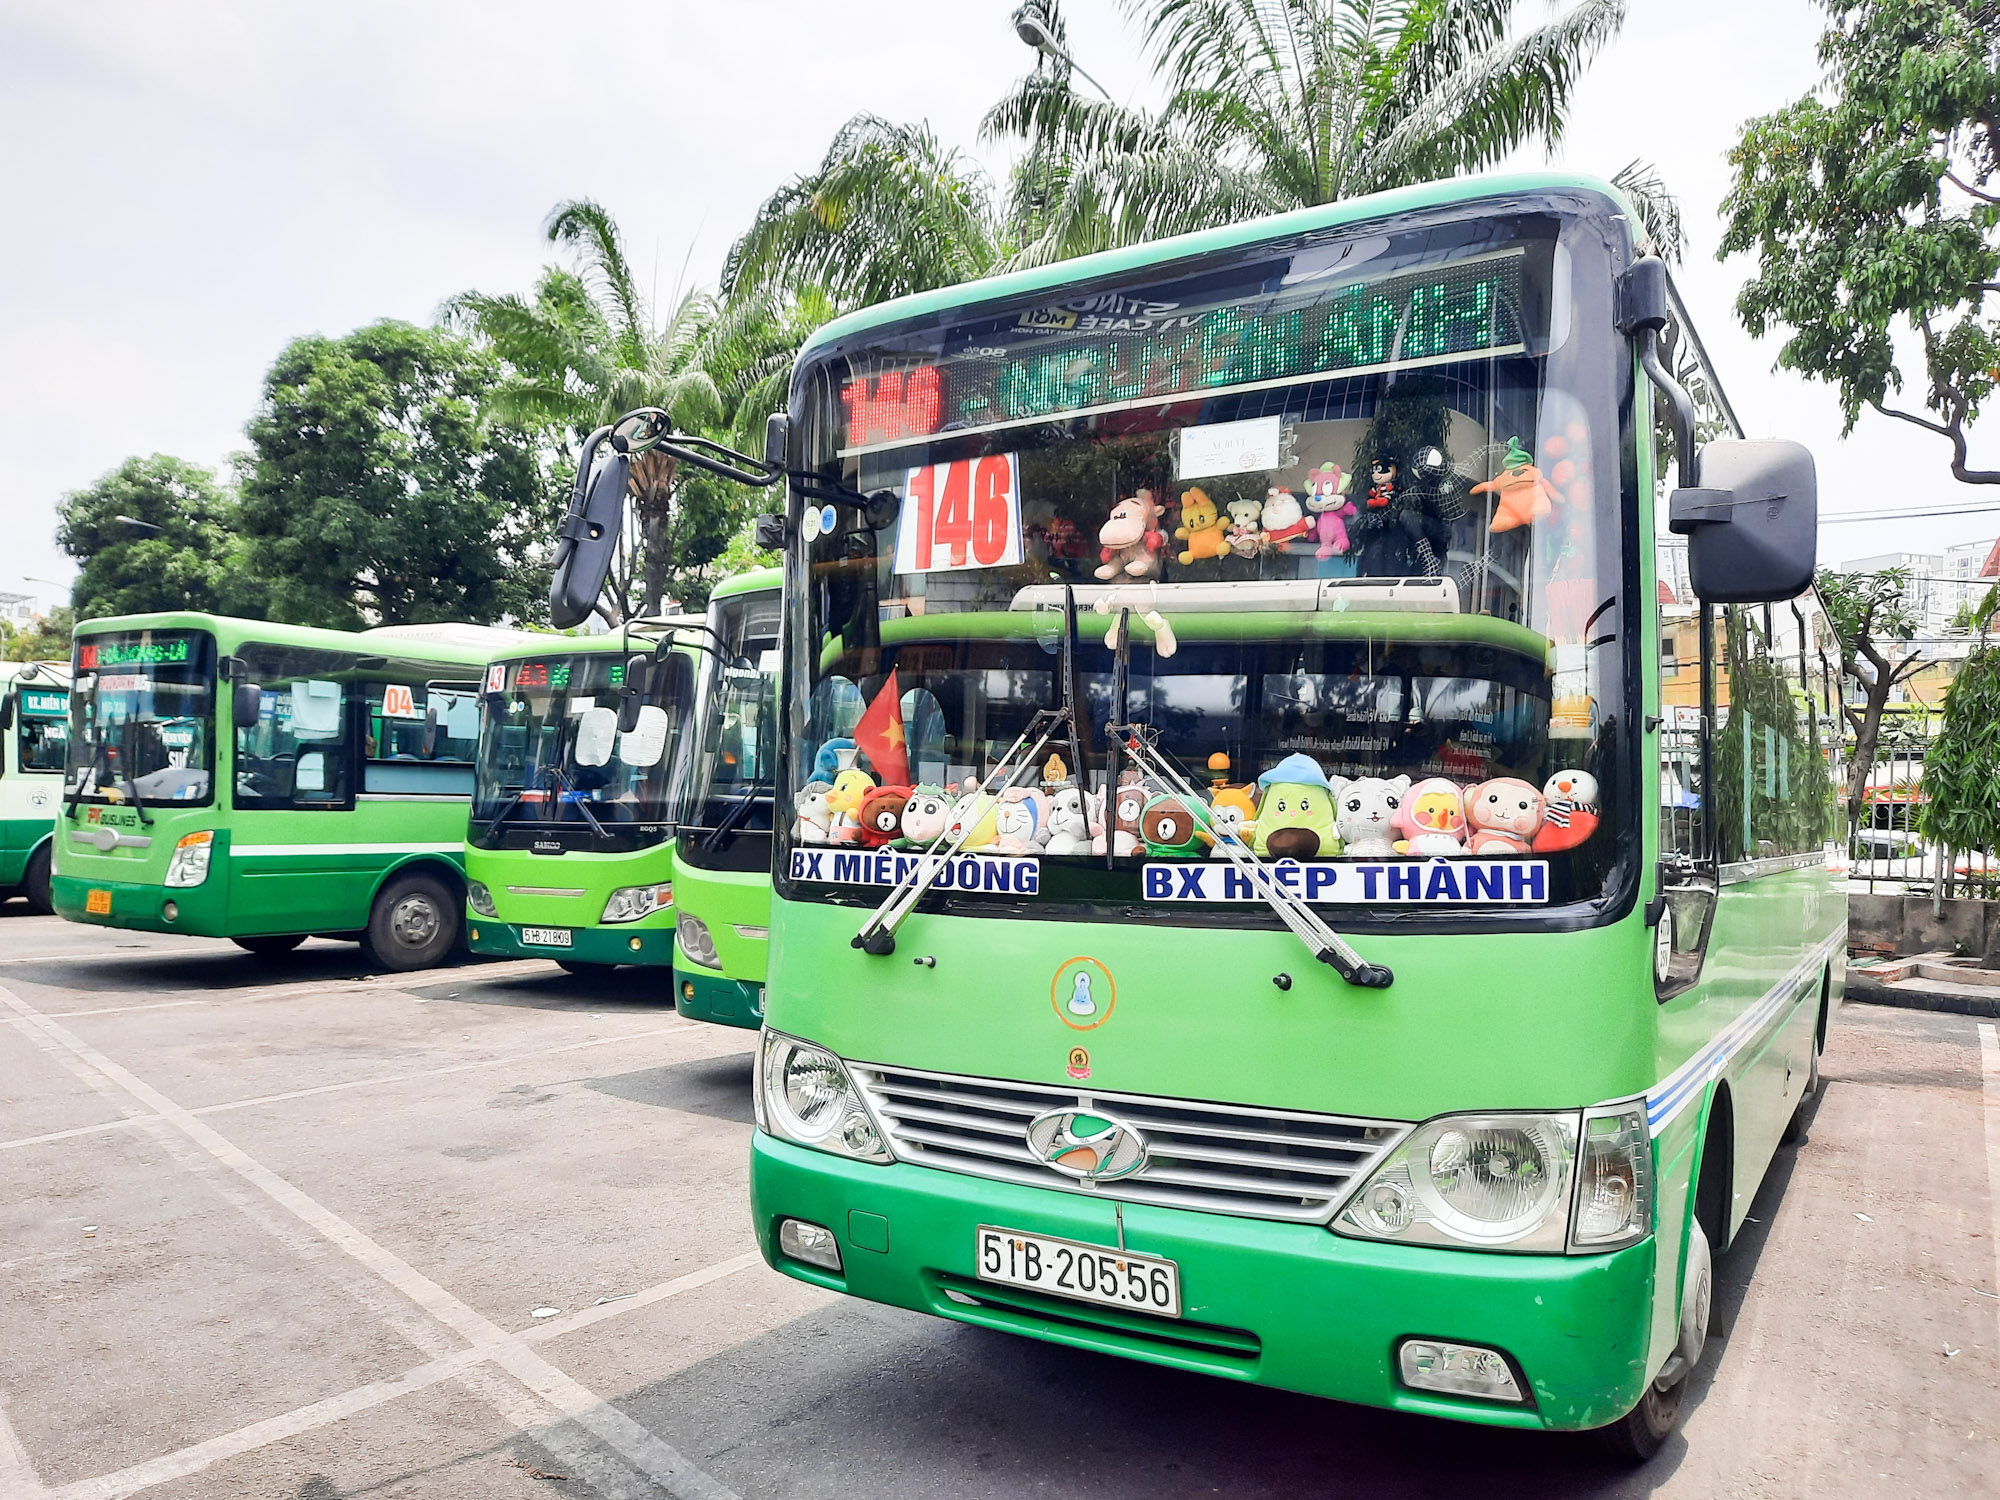 The bus parks at Mien Dong Bus Station at noon on May 12, 2021. Photo by VnExpress/Diep Phan.